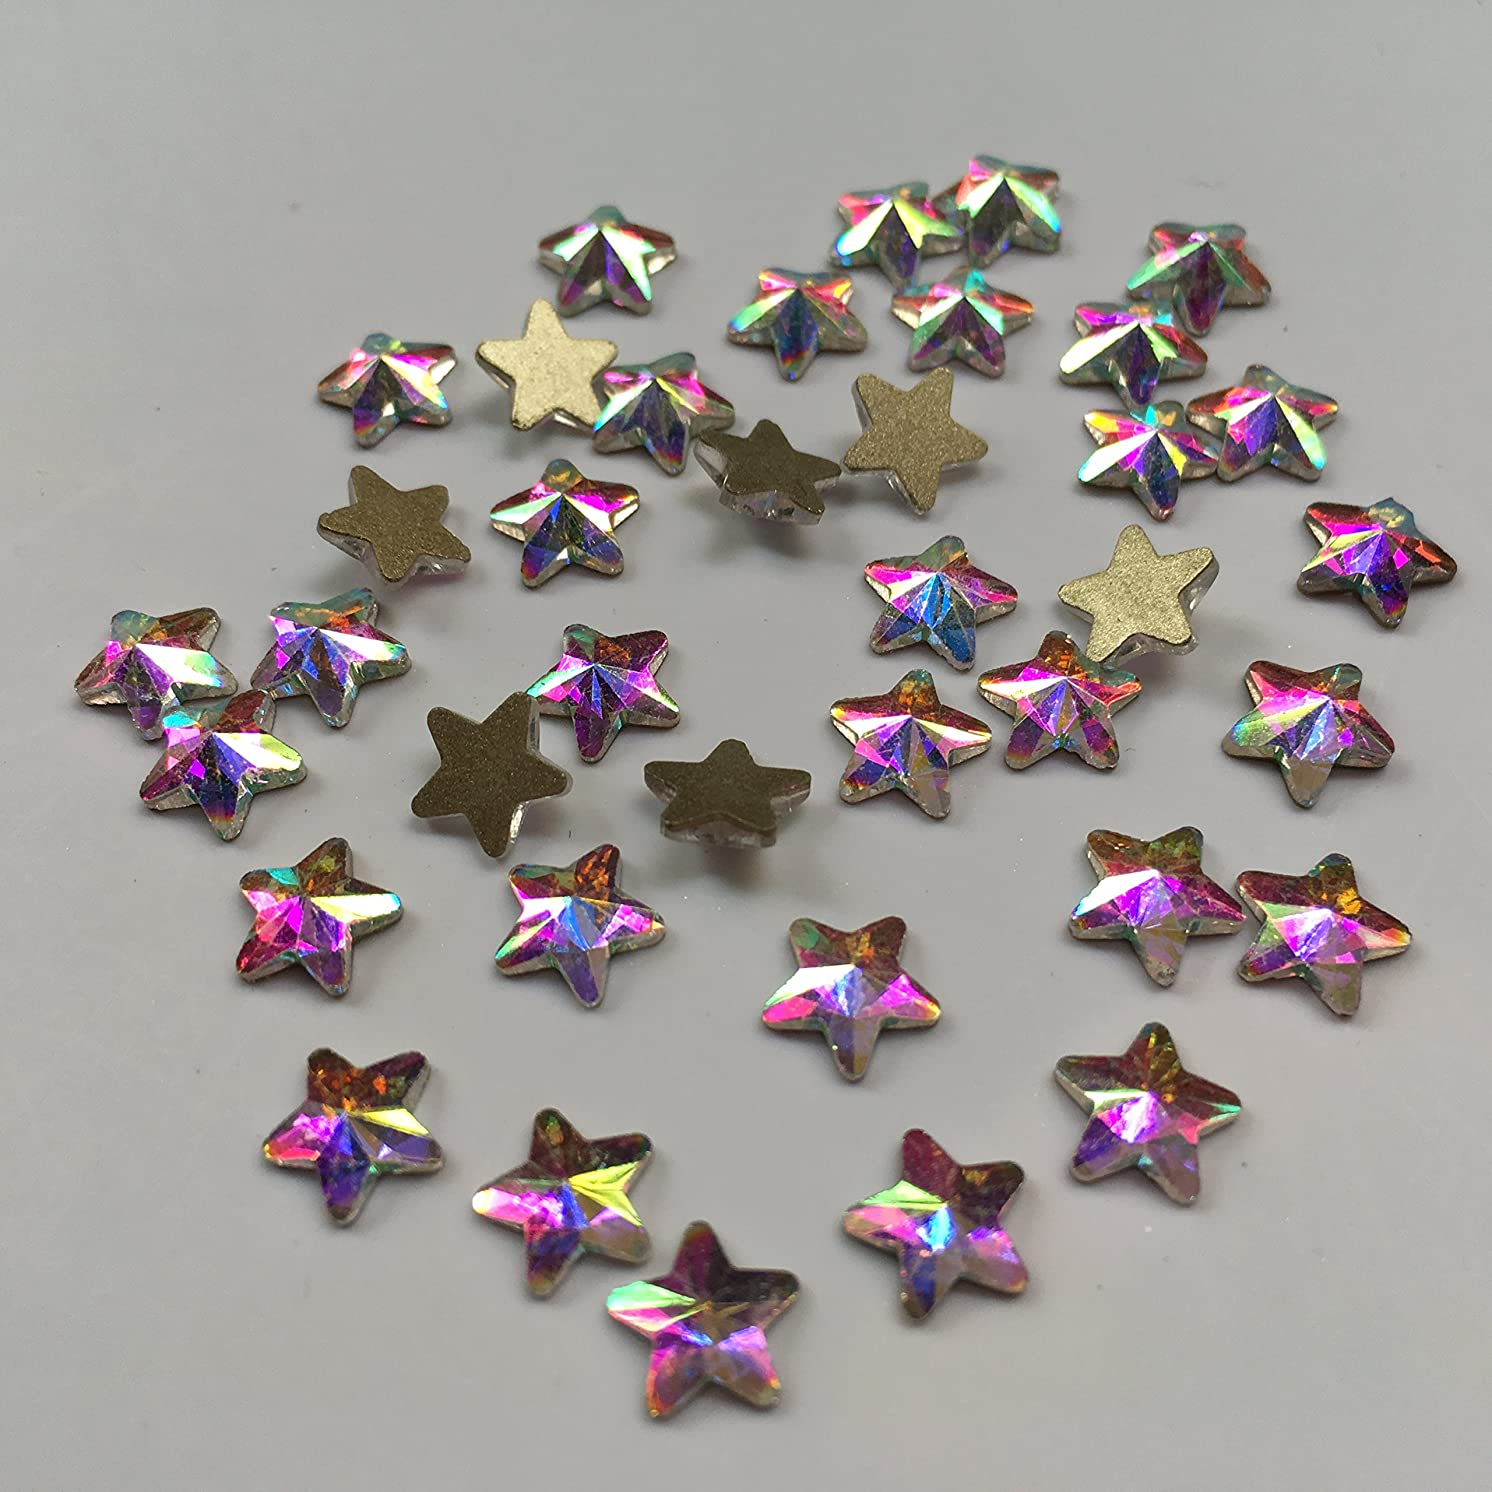 MIOBLET 30pcs Crystal AB 3D Nail Art Rhinestones Gems Flatback Stones DIY Decorations Manicure Diamond Jewelry For Nails Accessories (6x6mm Crystal AB Star)